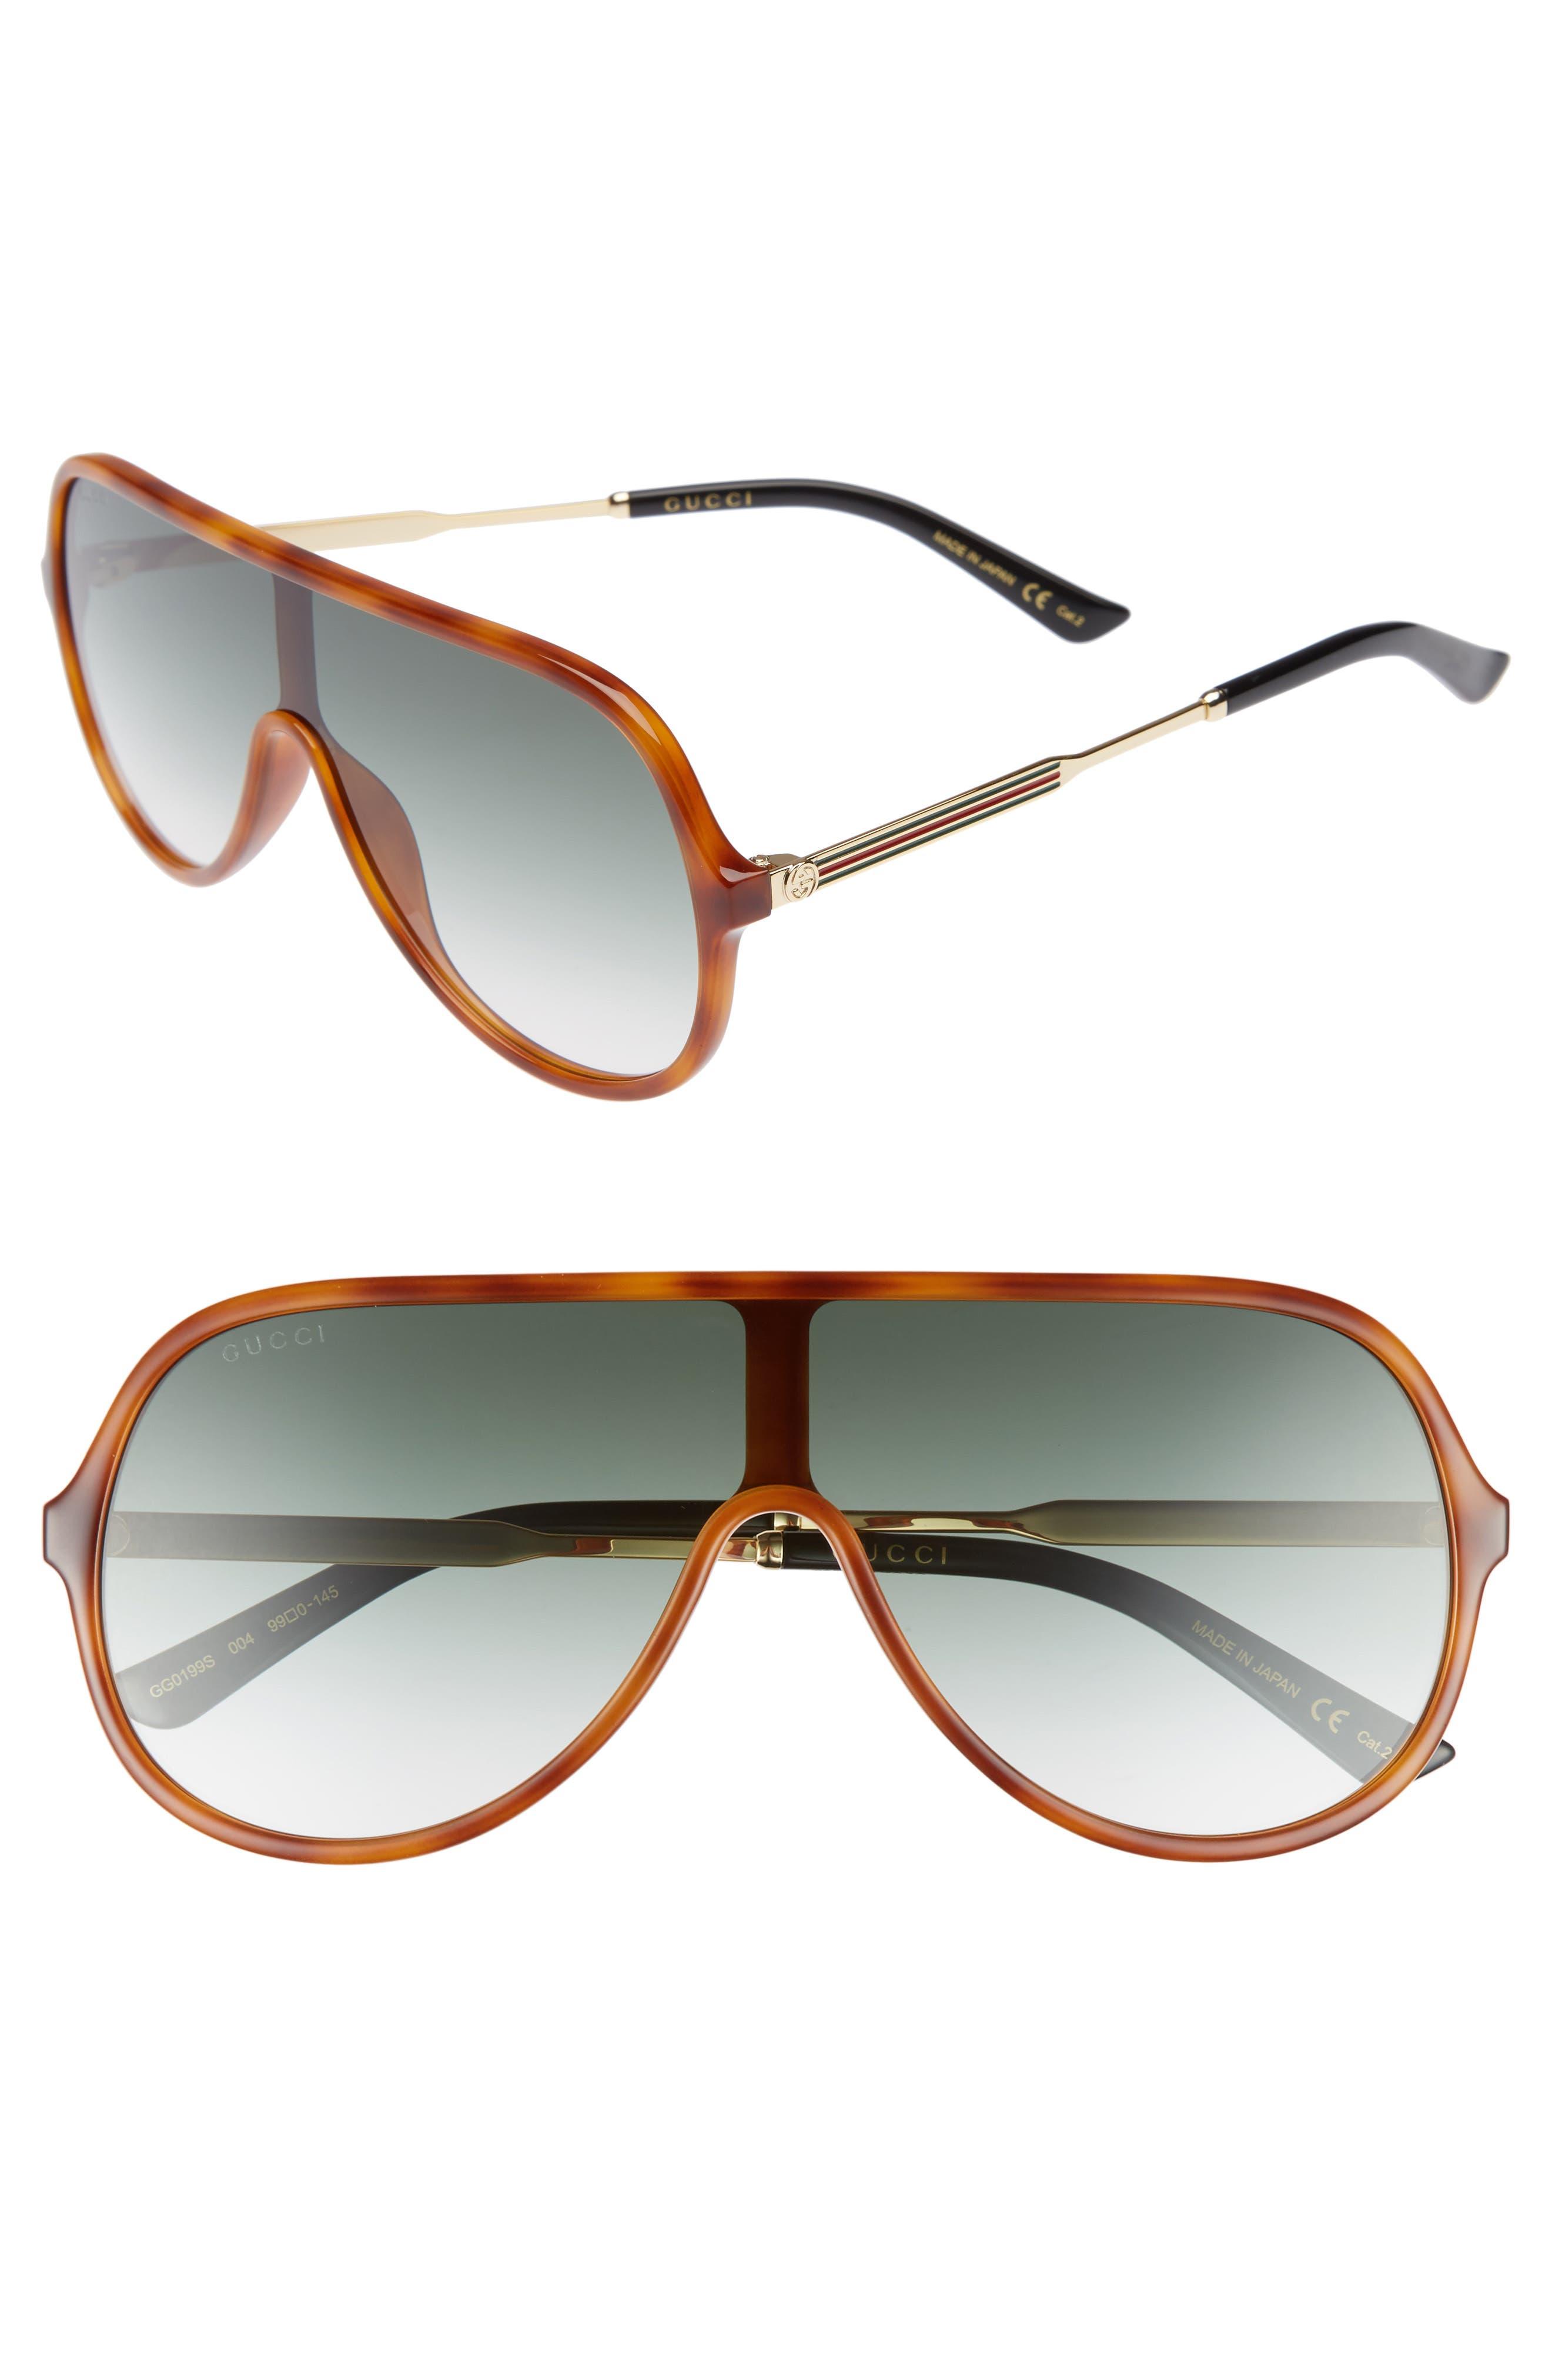 99mm Oversize Shield Sunglasses,                         Main,                         color, Blonde Havana